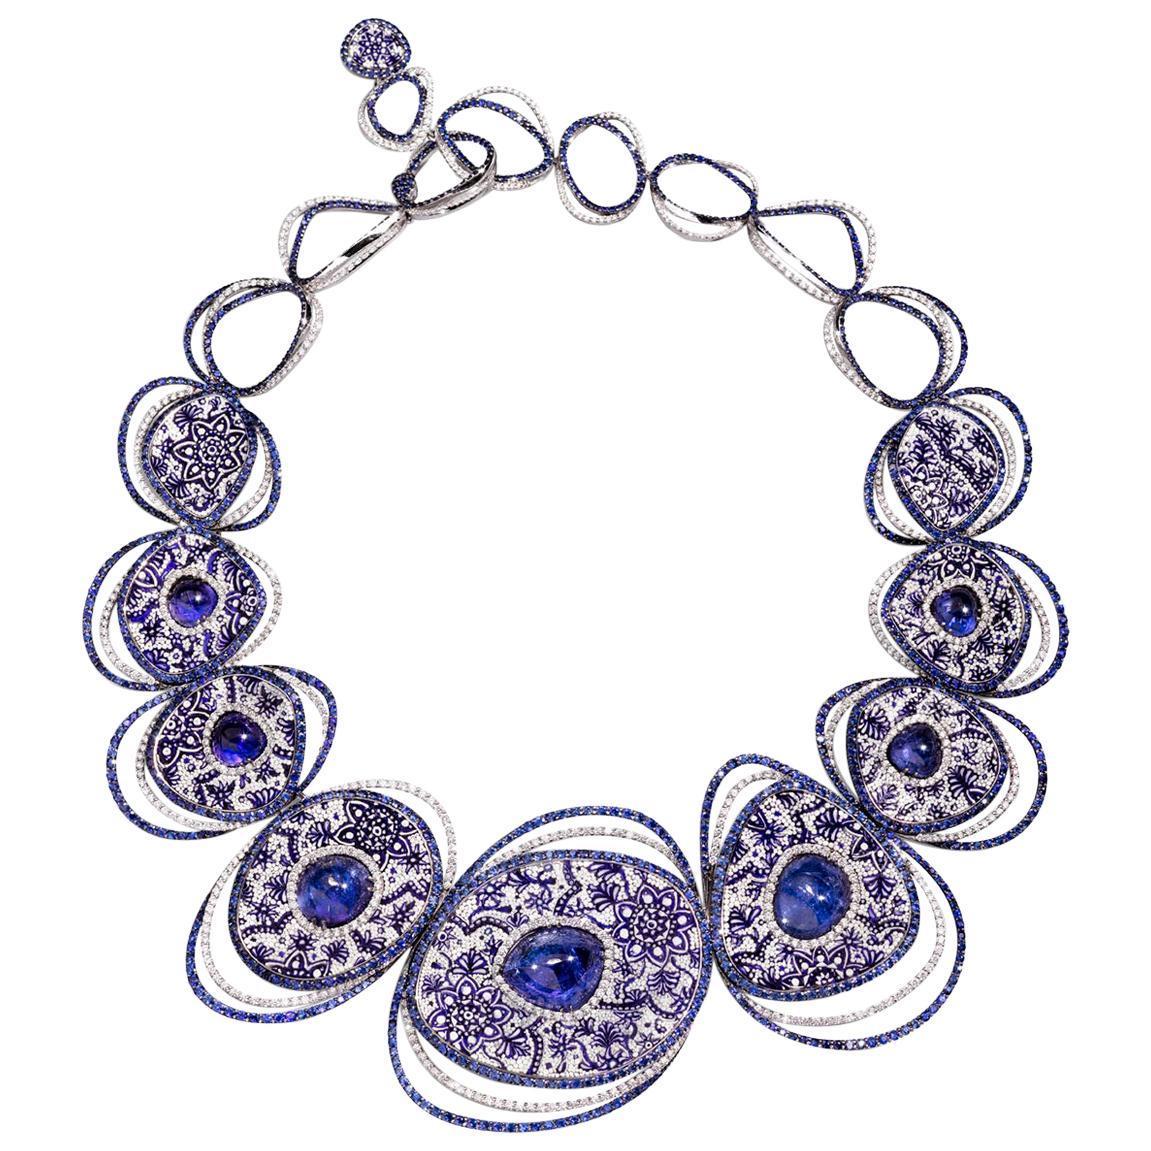 Necklace White Gold White Diamonds Sapphires Tanzanite HandDecorated Micromosaic